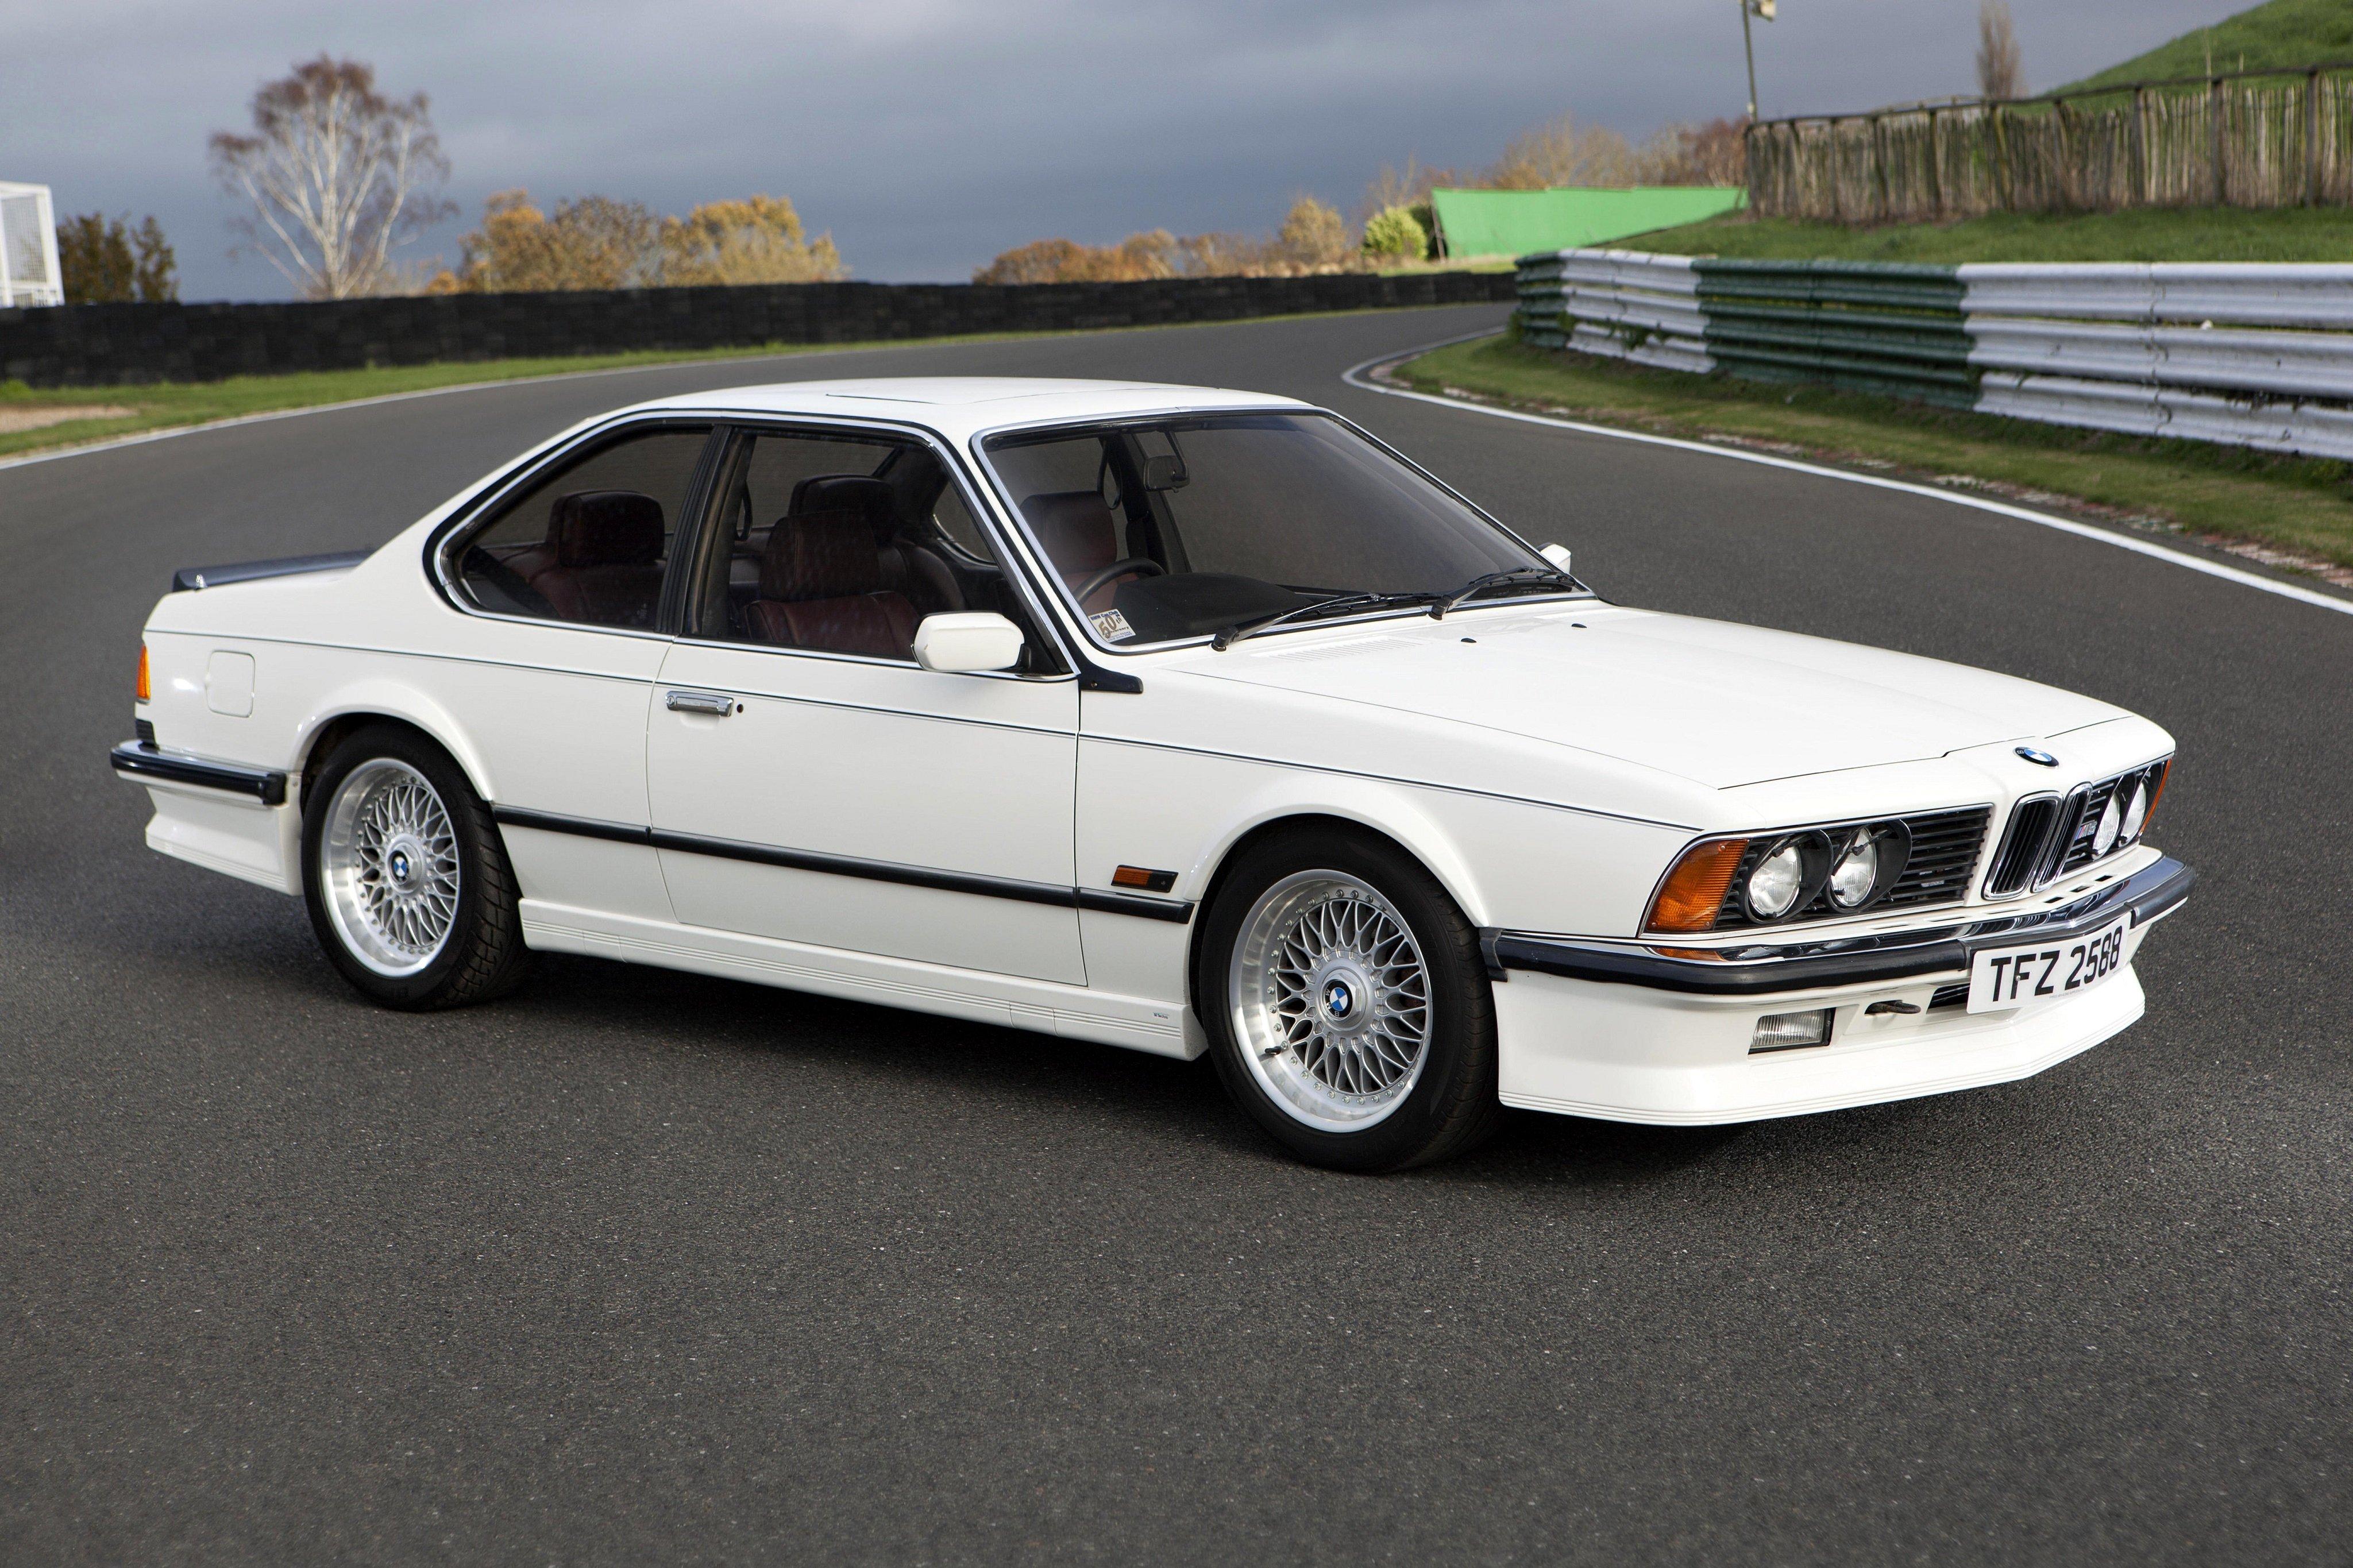 Bmw M635 Csi Uk Spec E24 Cars Coupe White 1984 Wallpaper